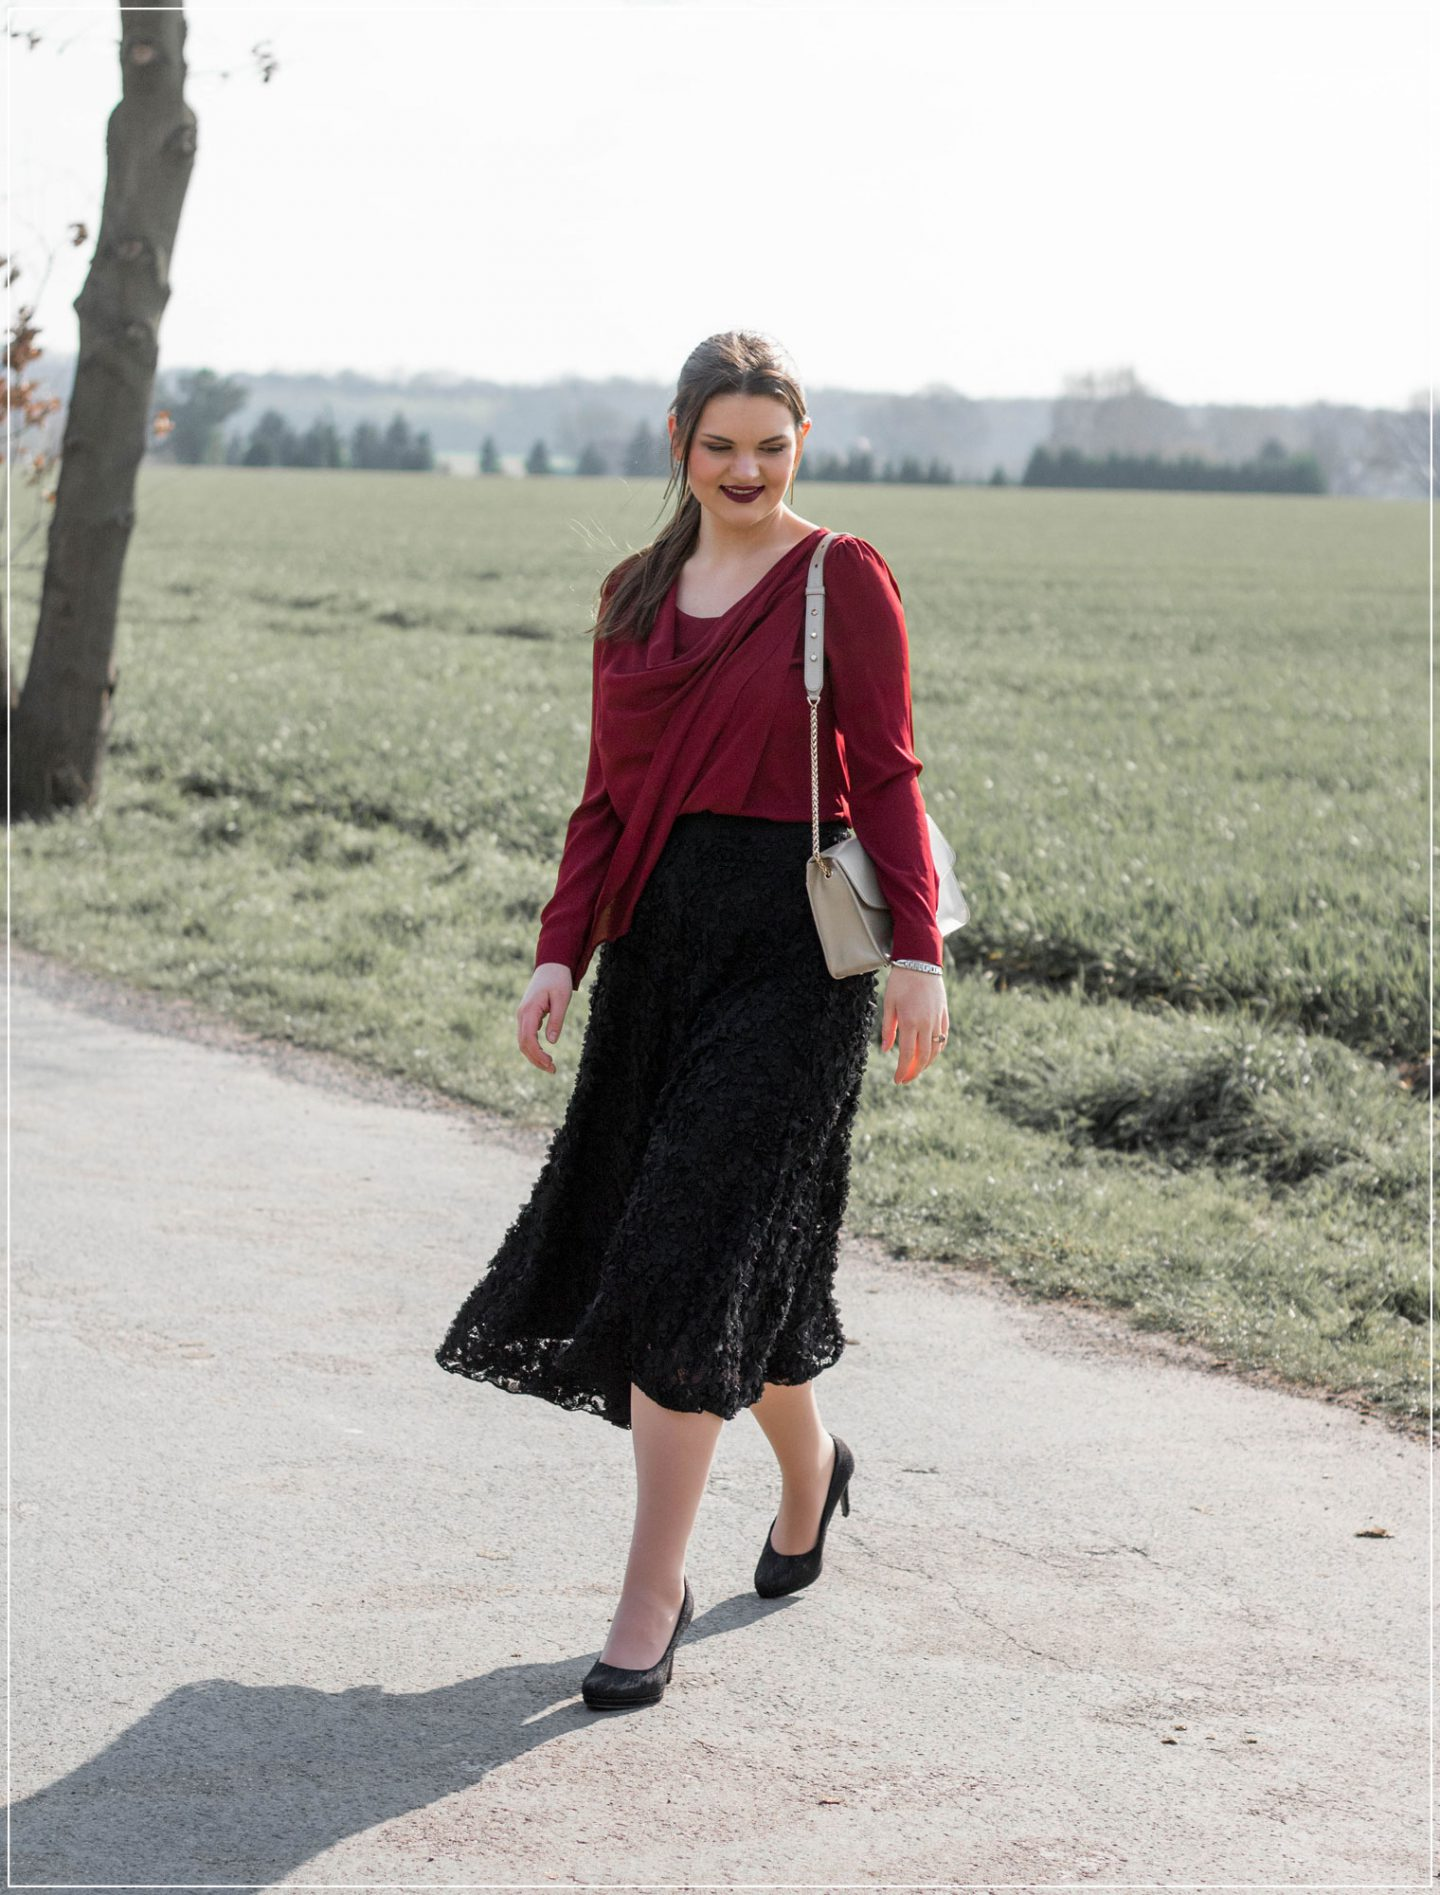 3D-Spitze, Modetrend, Midi-Rock, Frühlingsoutfit, eleganter Style, Styleguide, Outfitinspiration, Modebloggerin, Fashionbloggerin, Modeblog, Ruhrgebiet